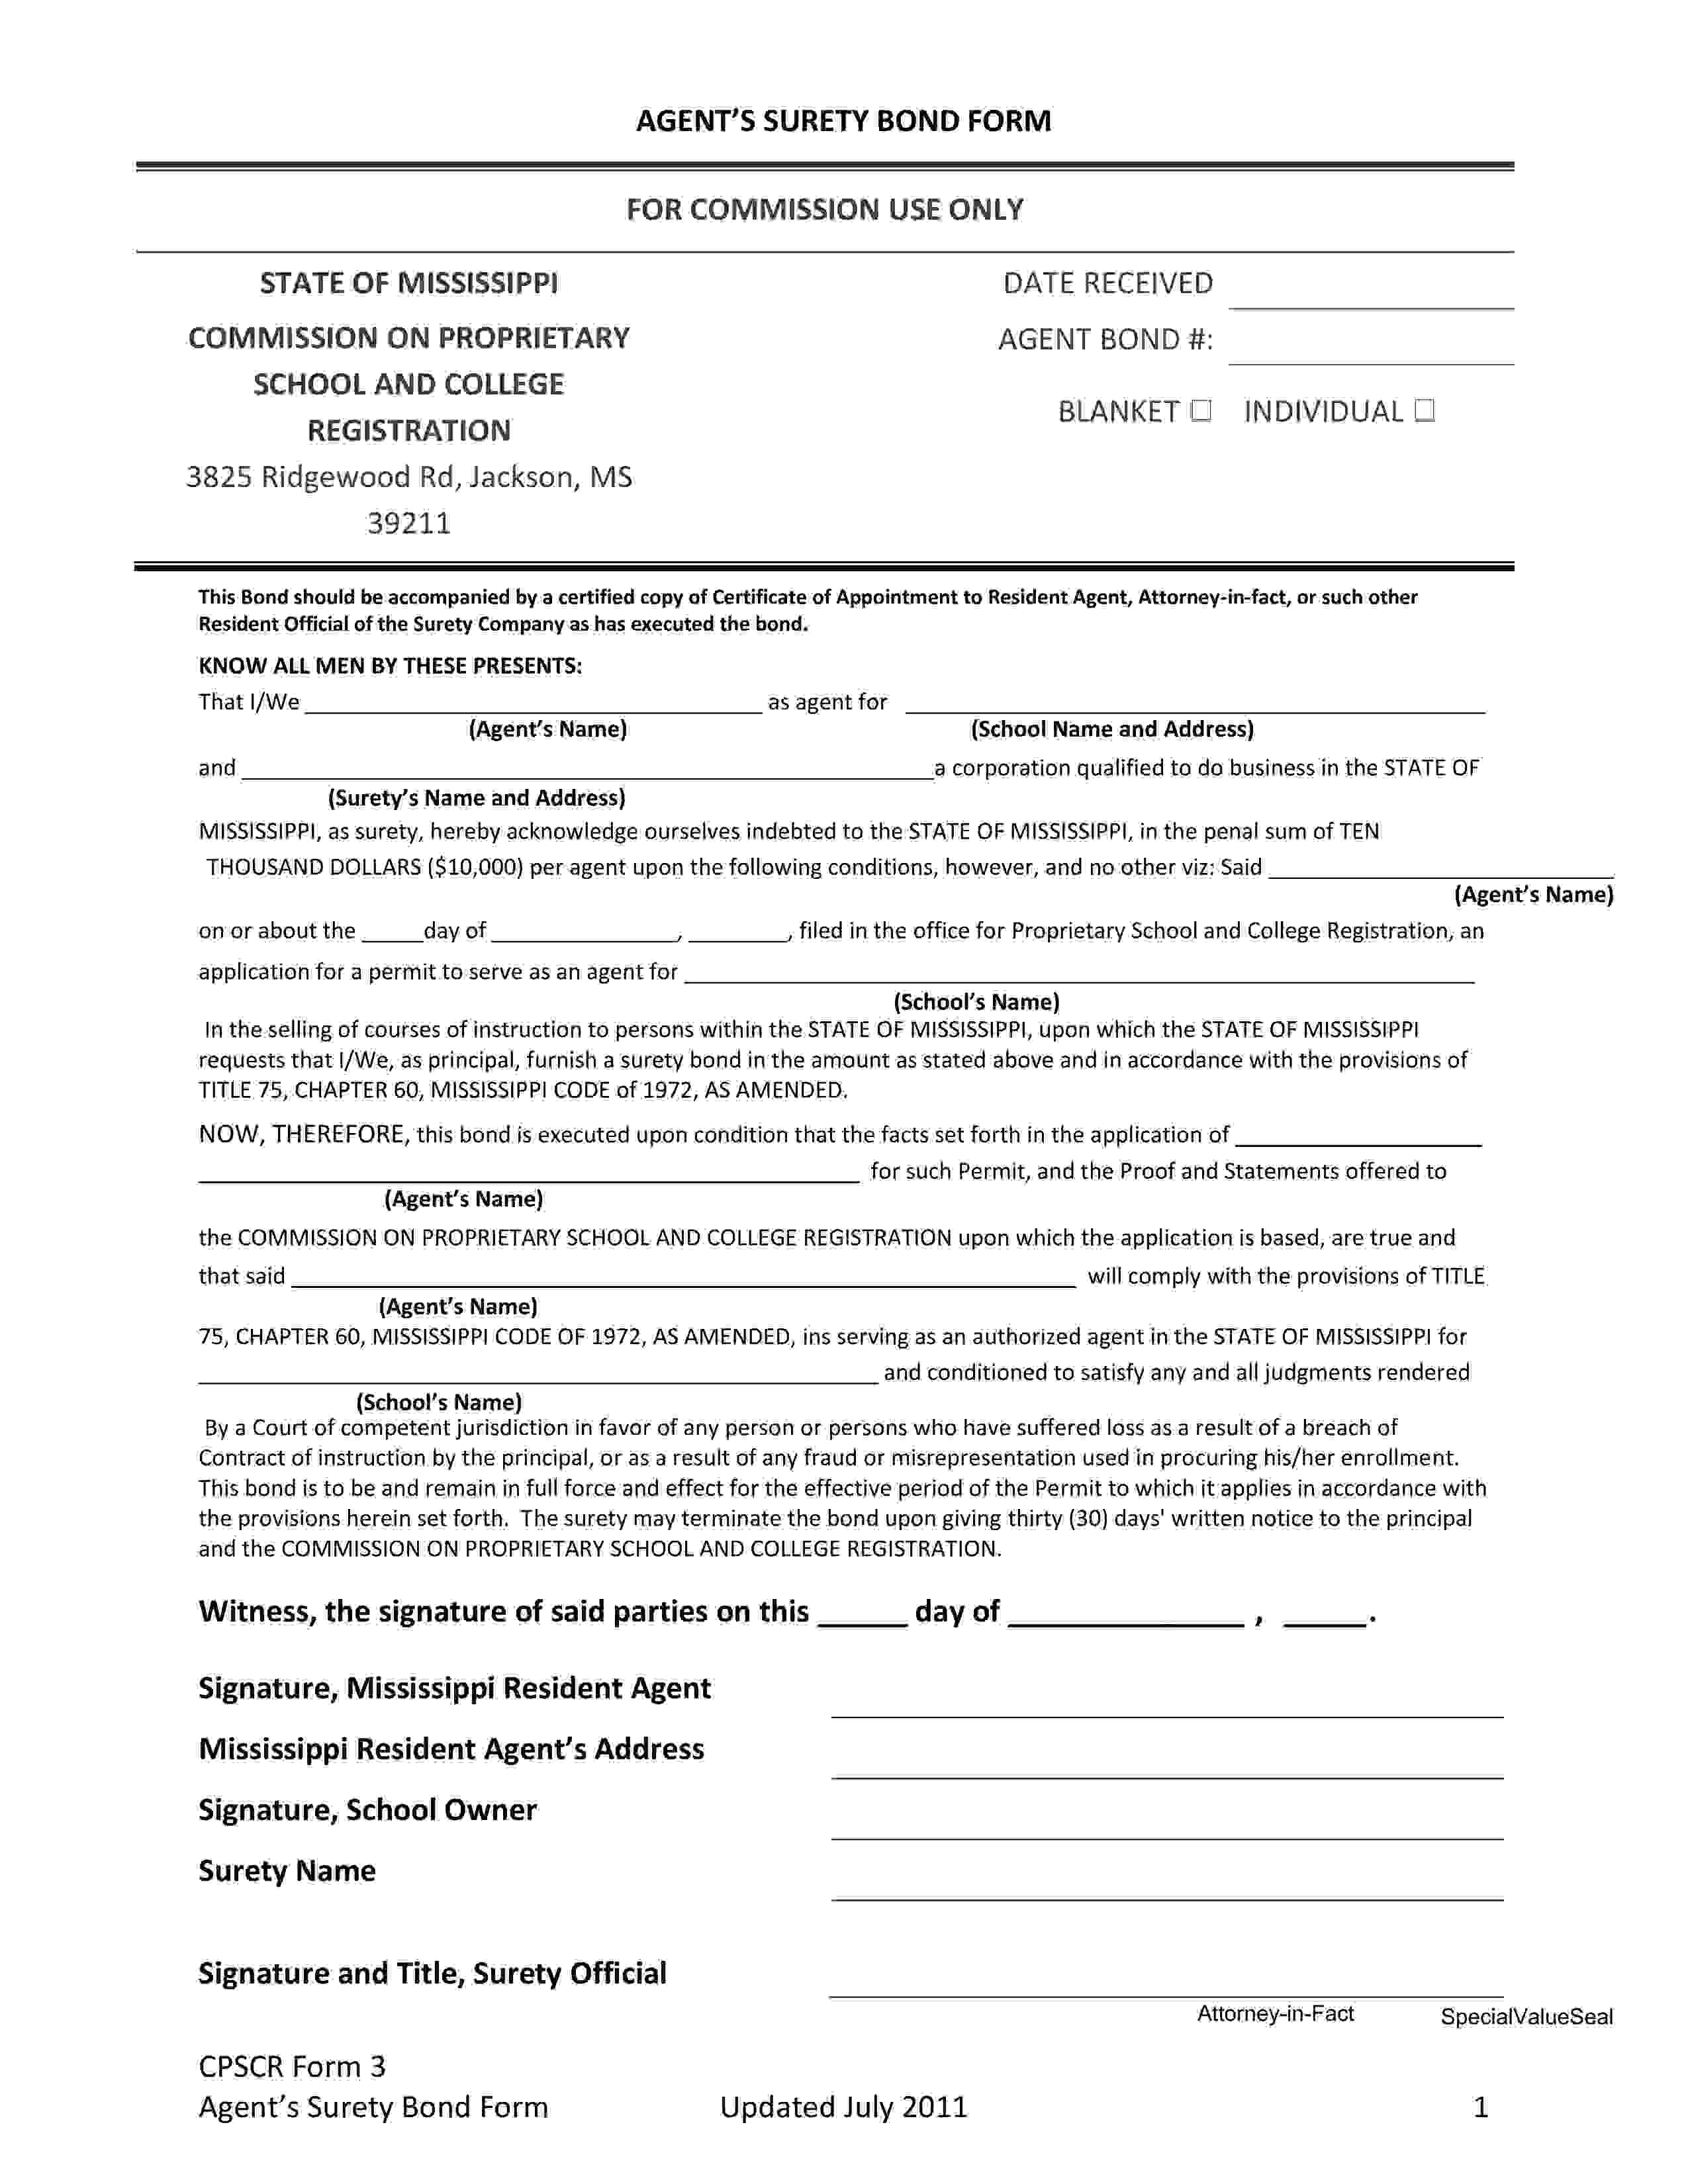 Mississippi Commission on Proprietary School and College Registration Proprietary School Agent - Blanket Bond sample image